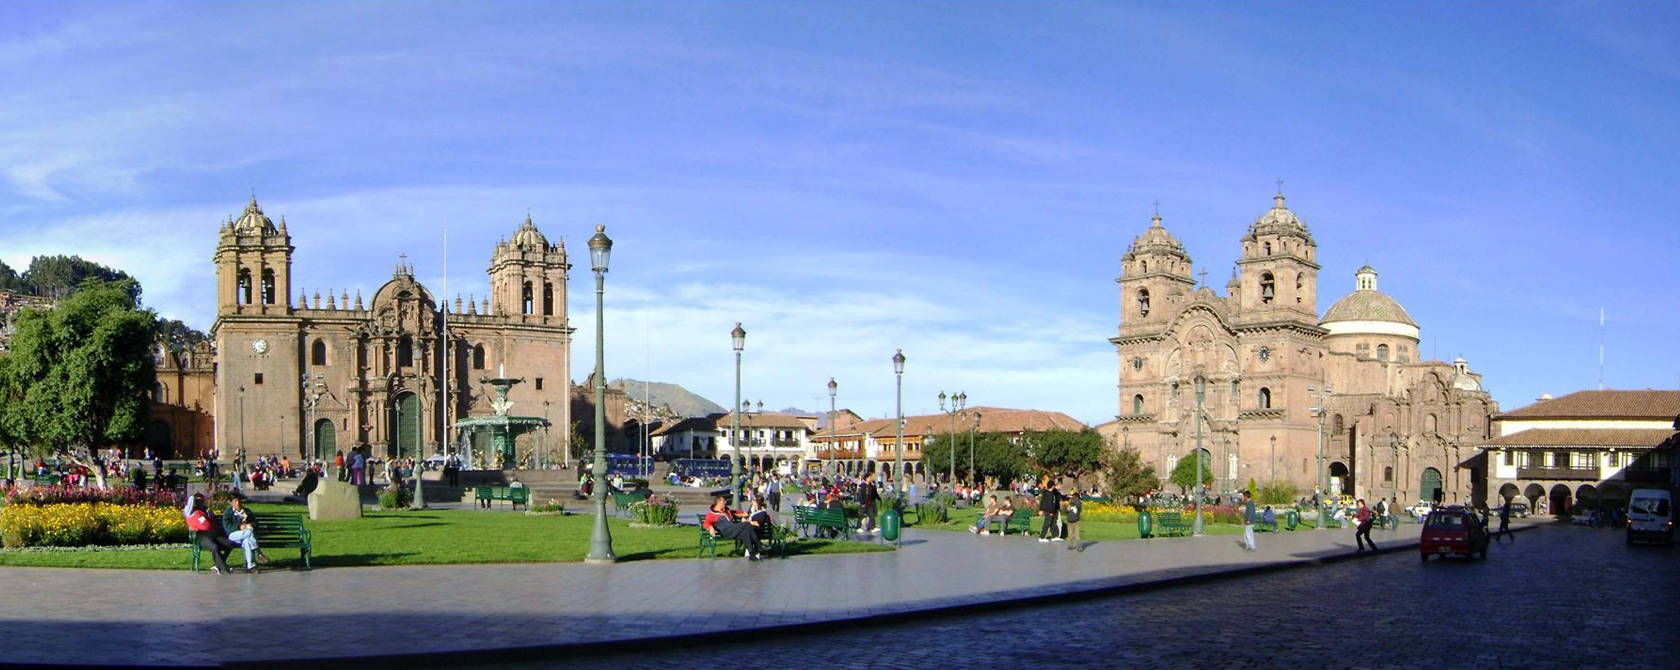 plaza-de-armas-cusco-hotel-inka-andina